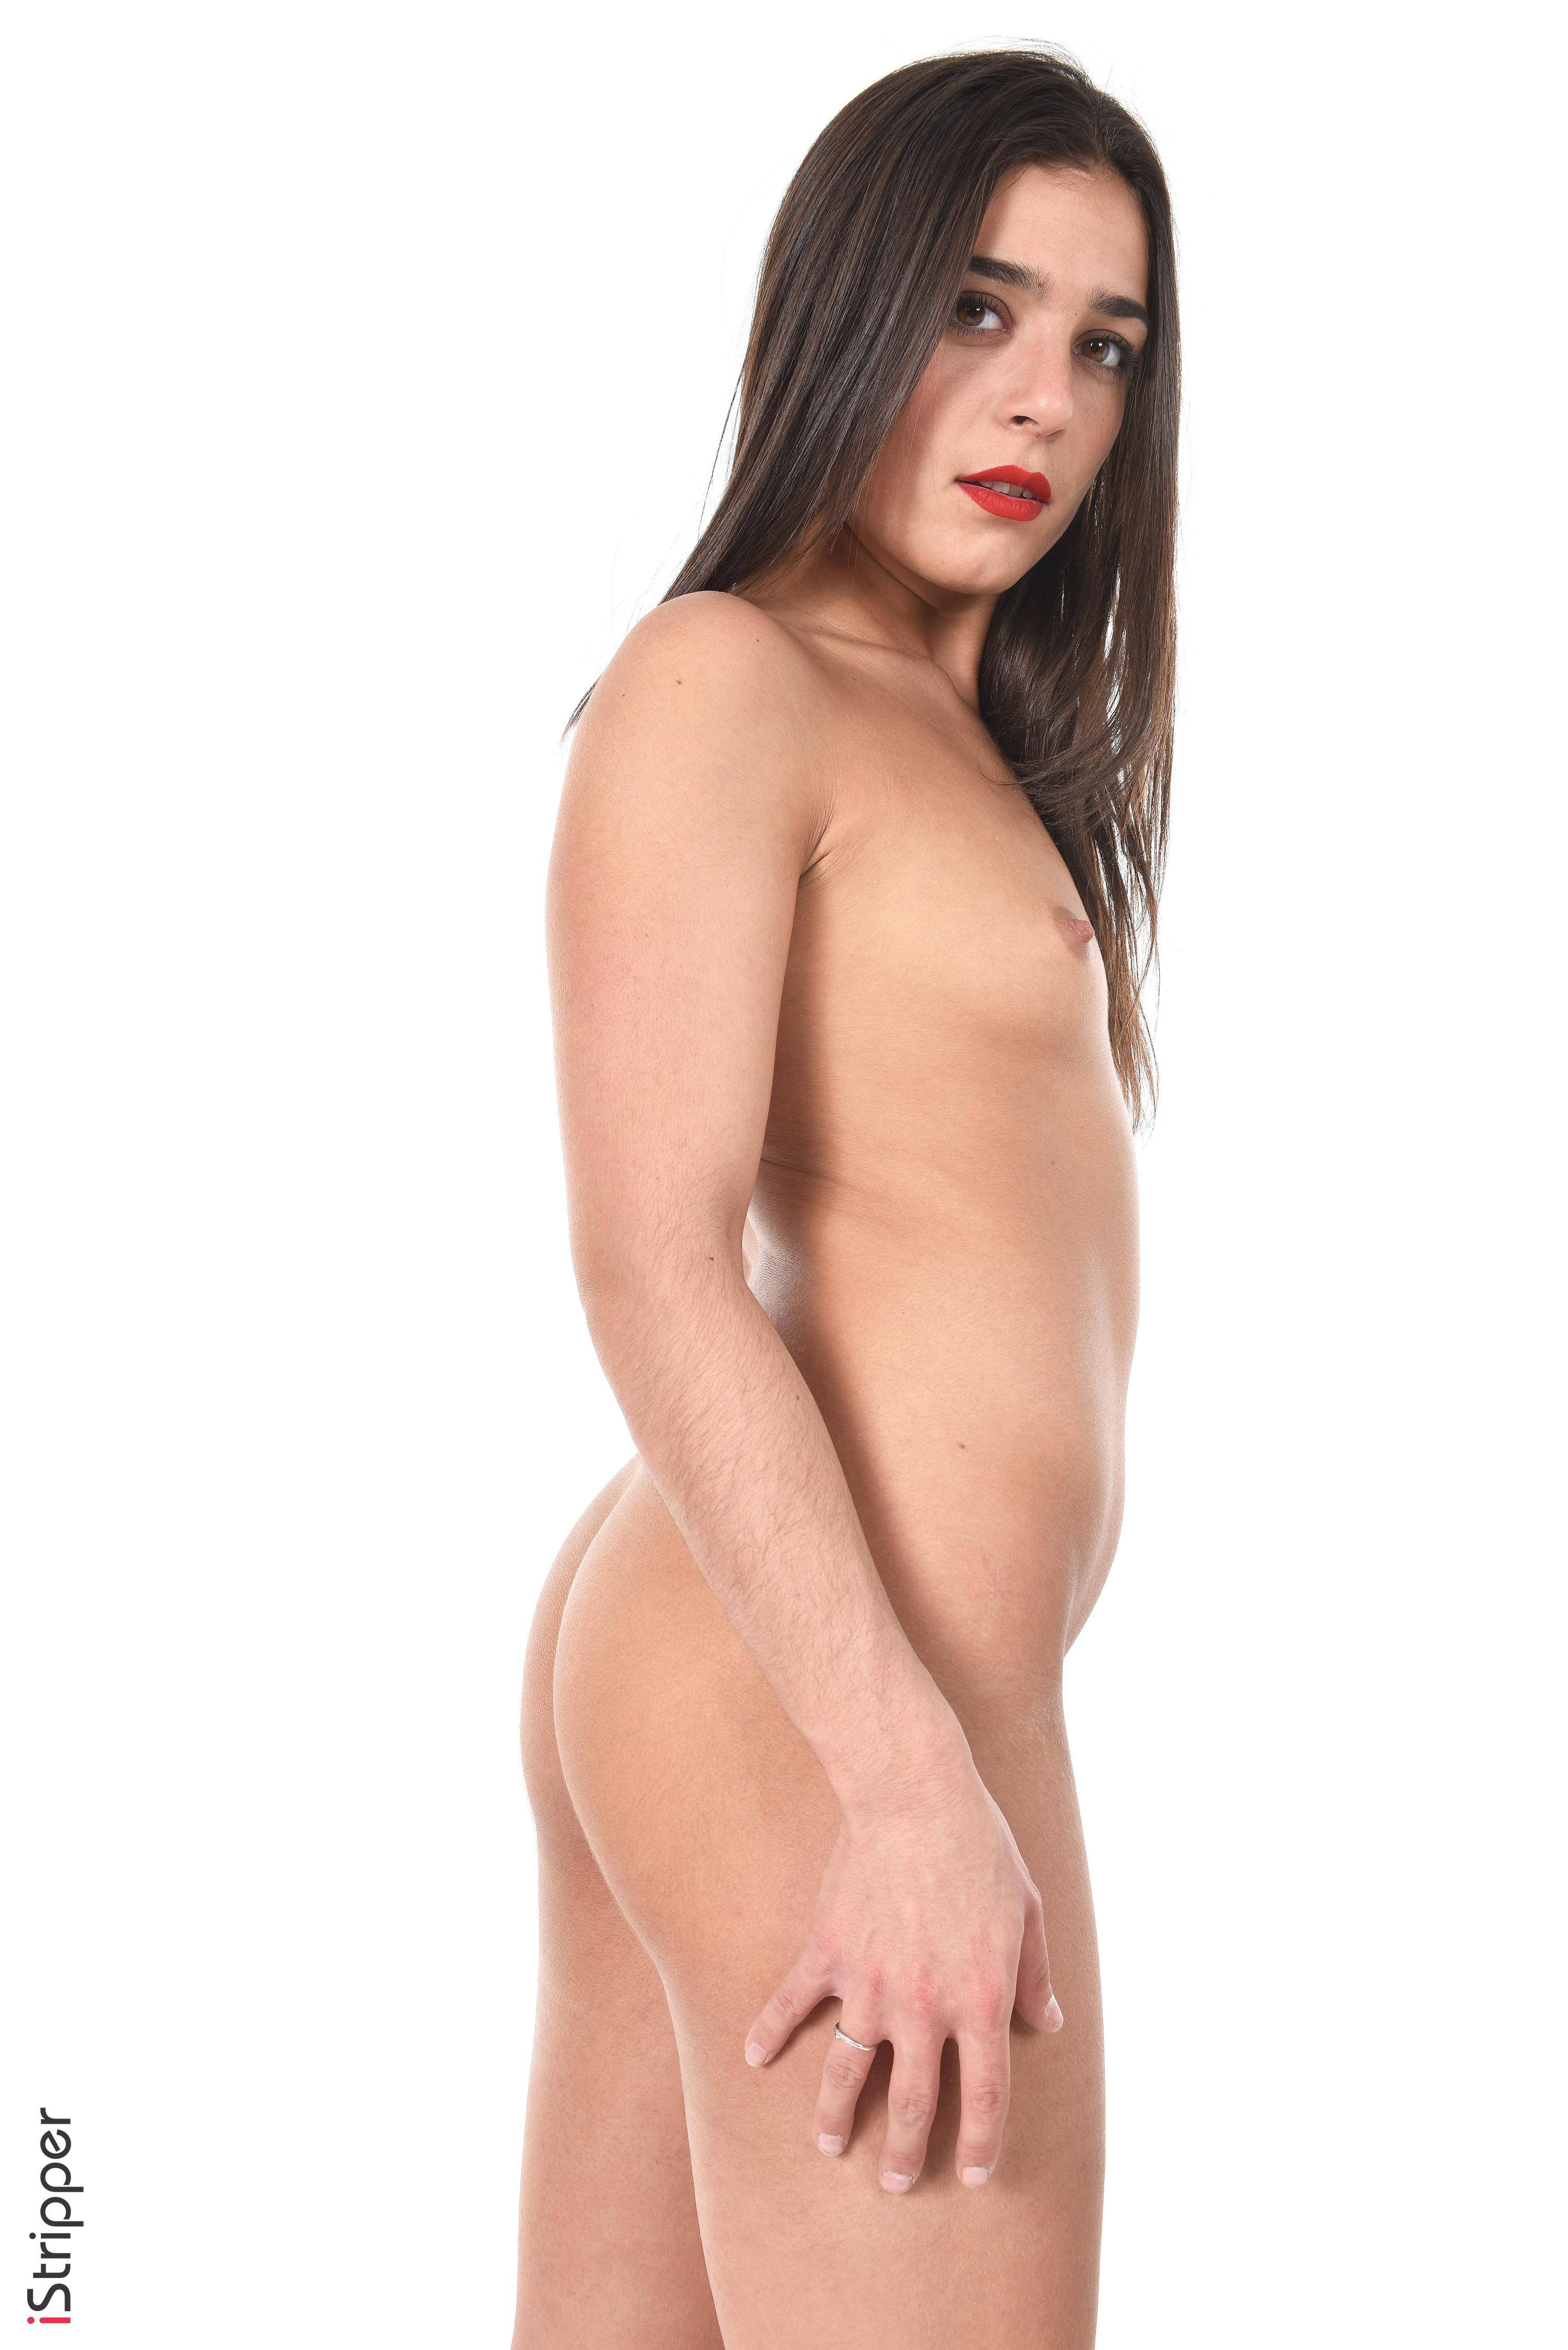 screensaver nude